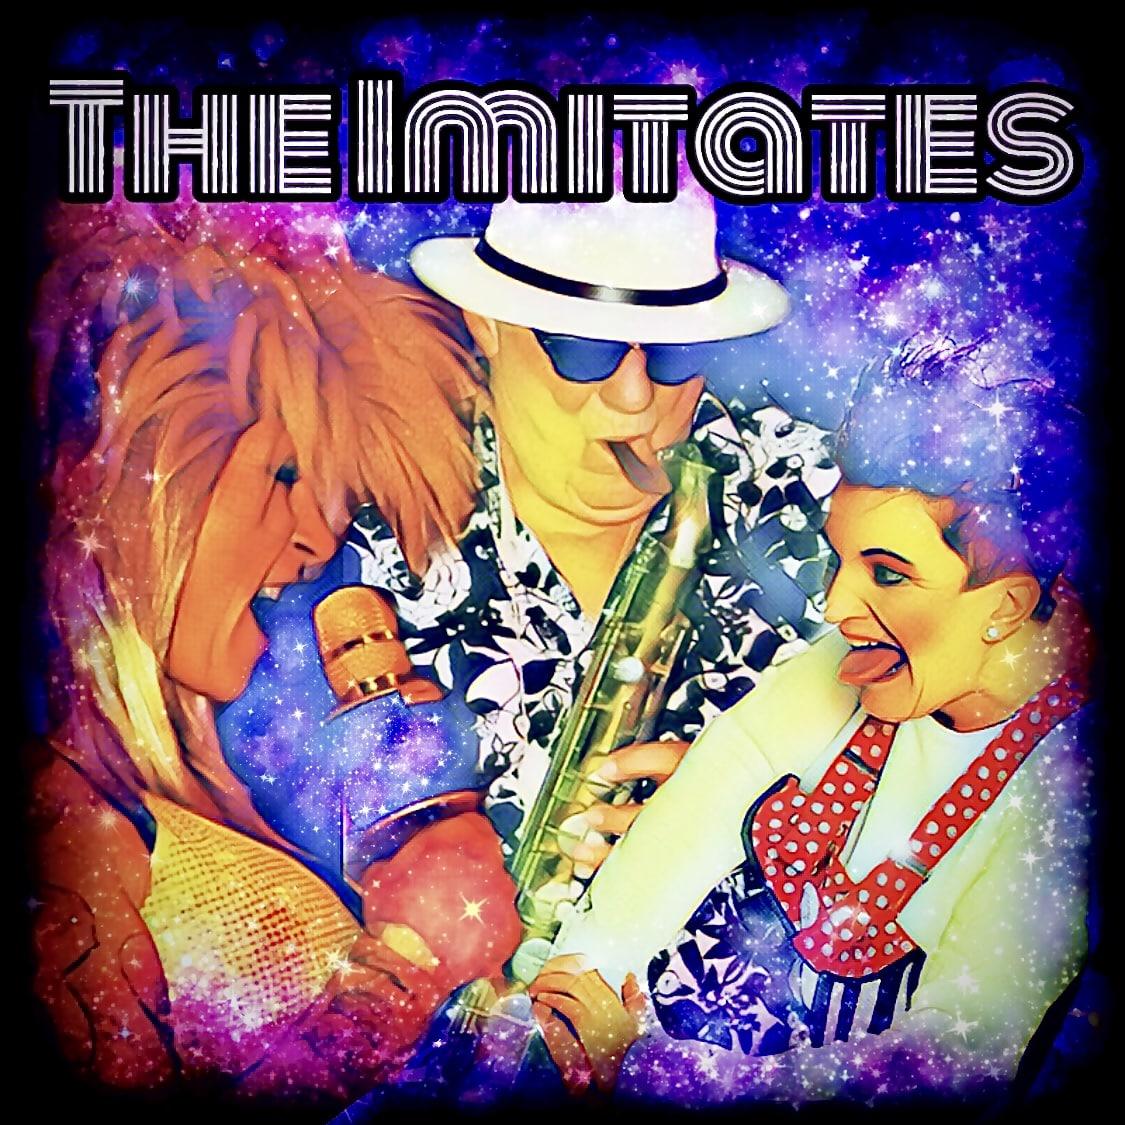 The Imitates